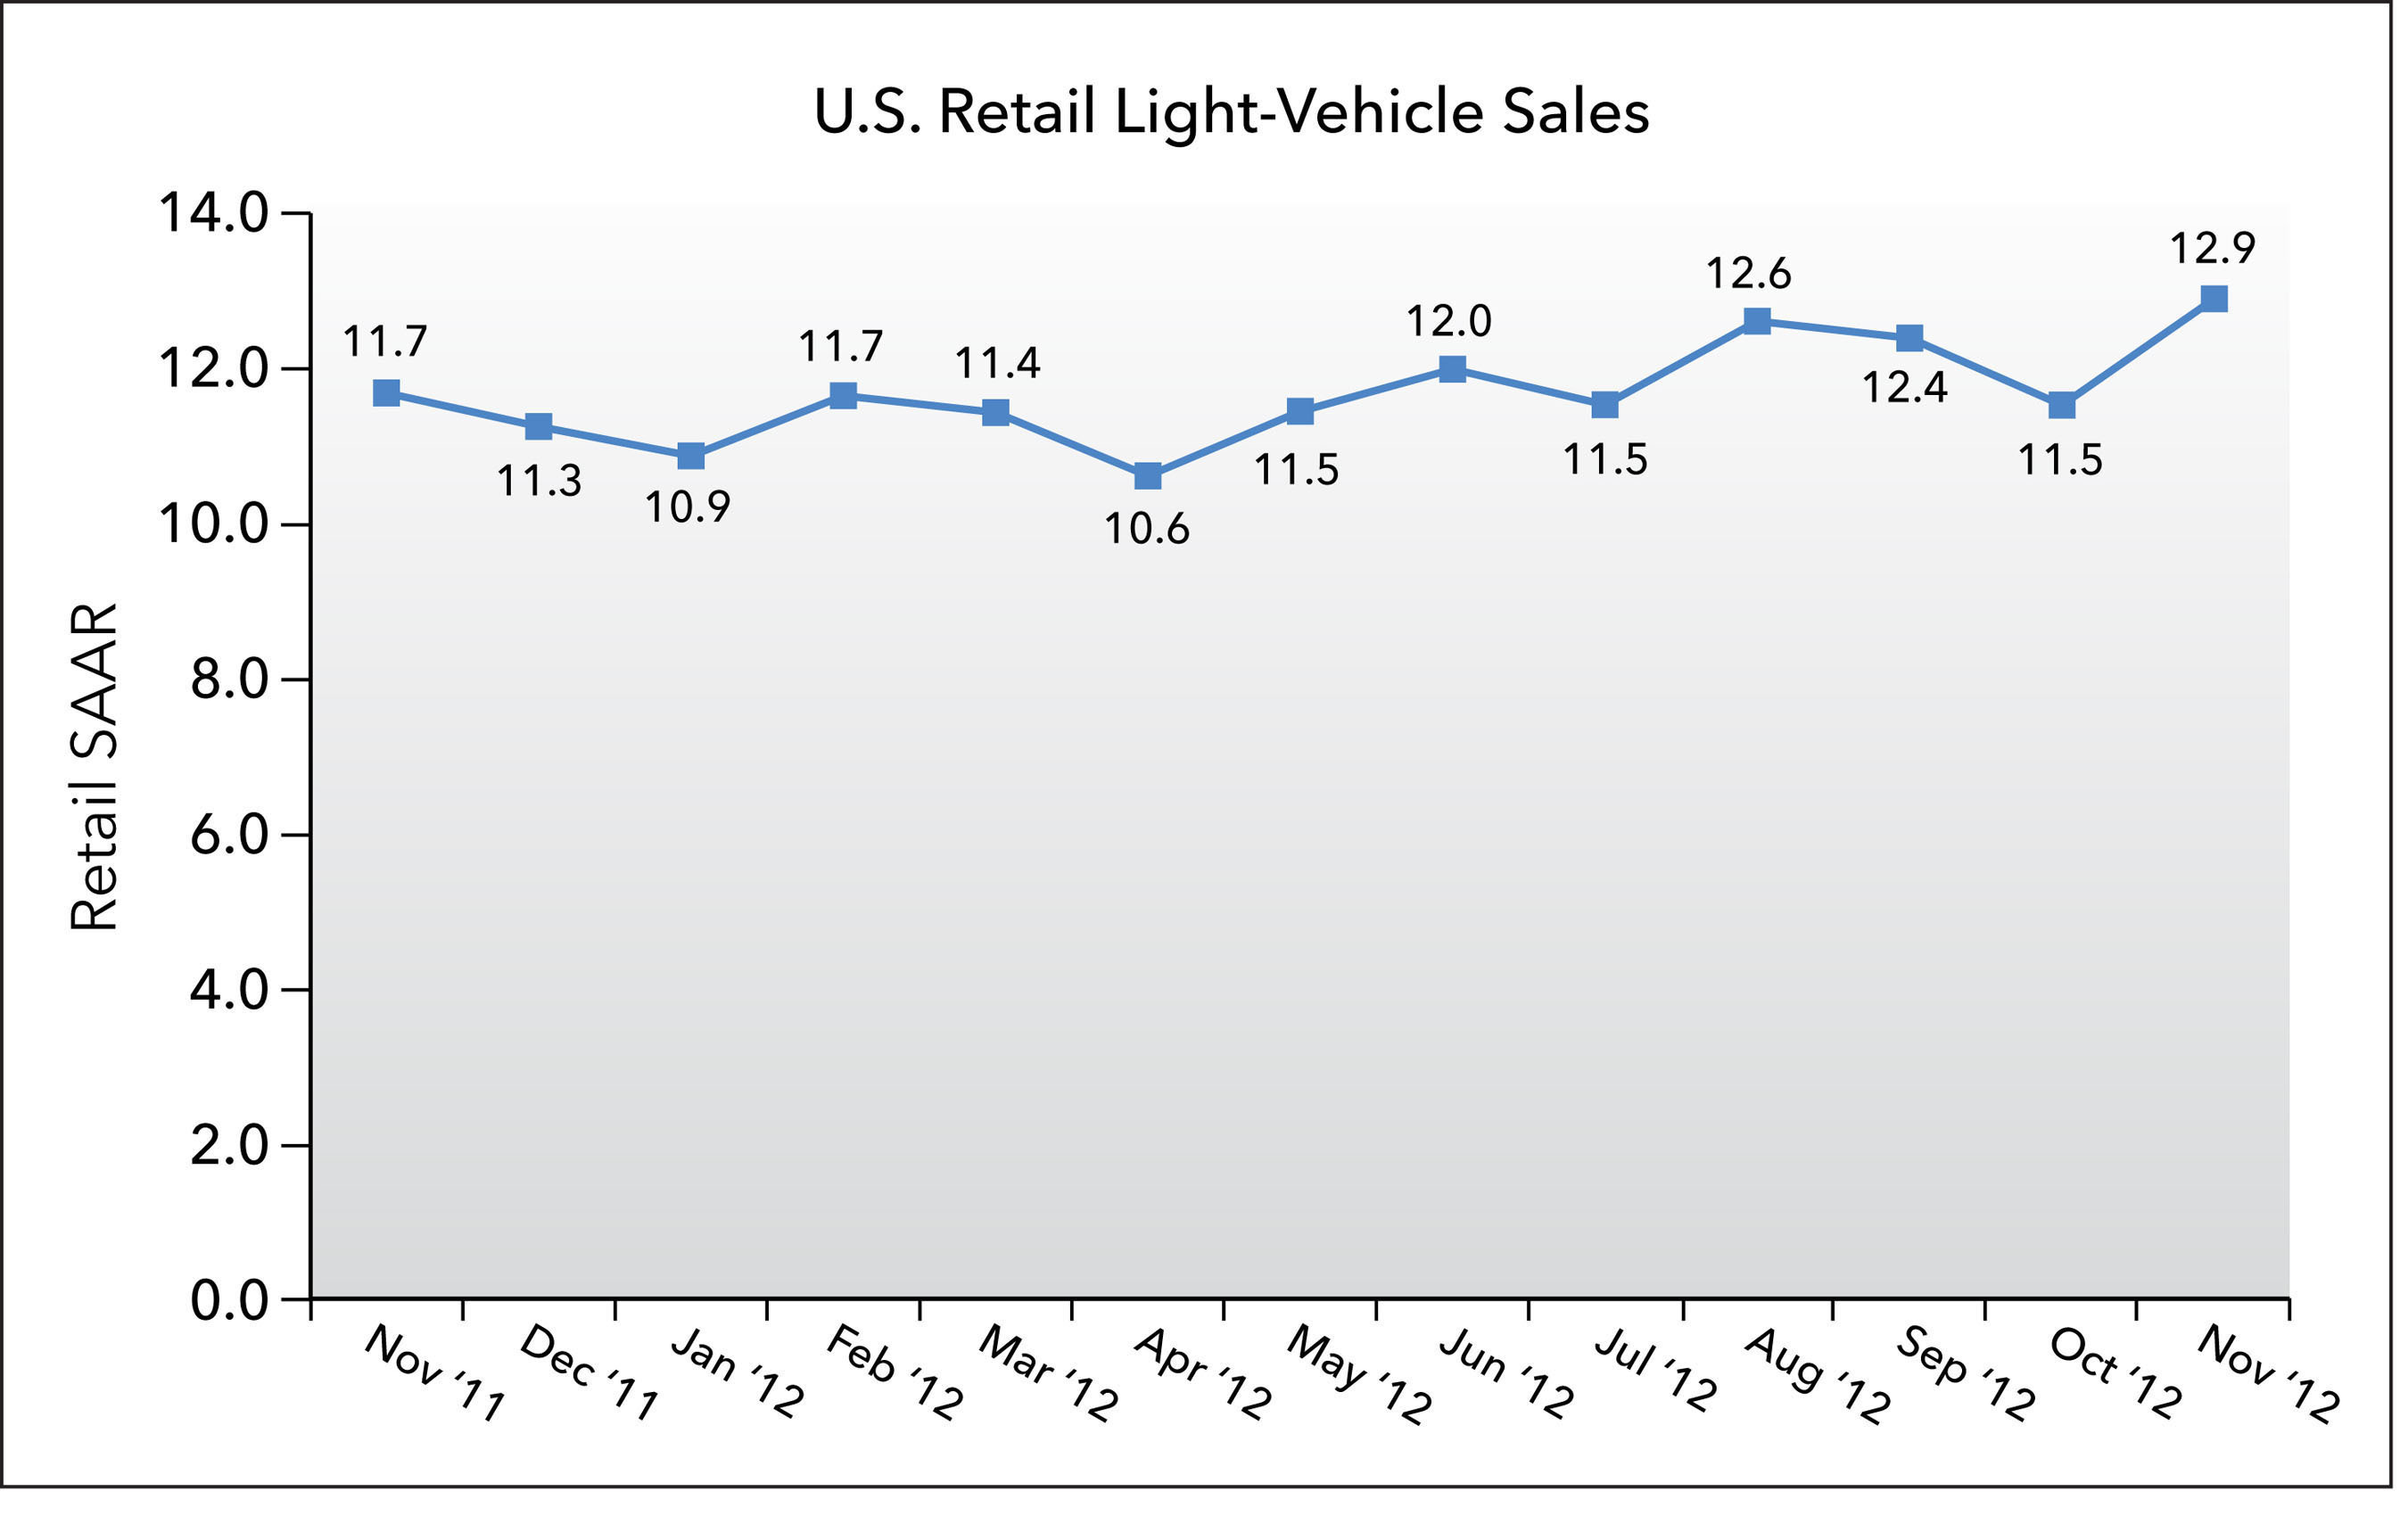 U.S. Retail SAAR--November 2011 to November 2012 (in millions of units).  (PRNewsFoto/J.D. Power and Associates)